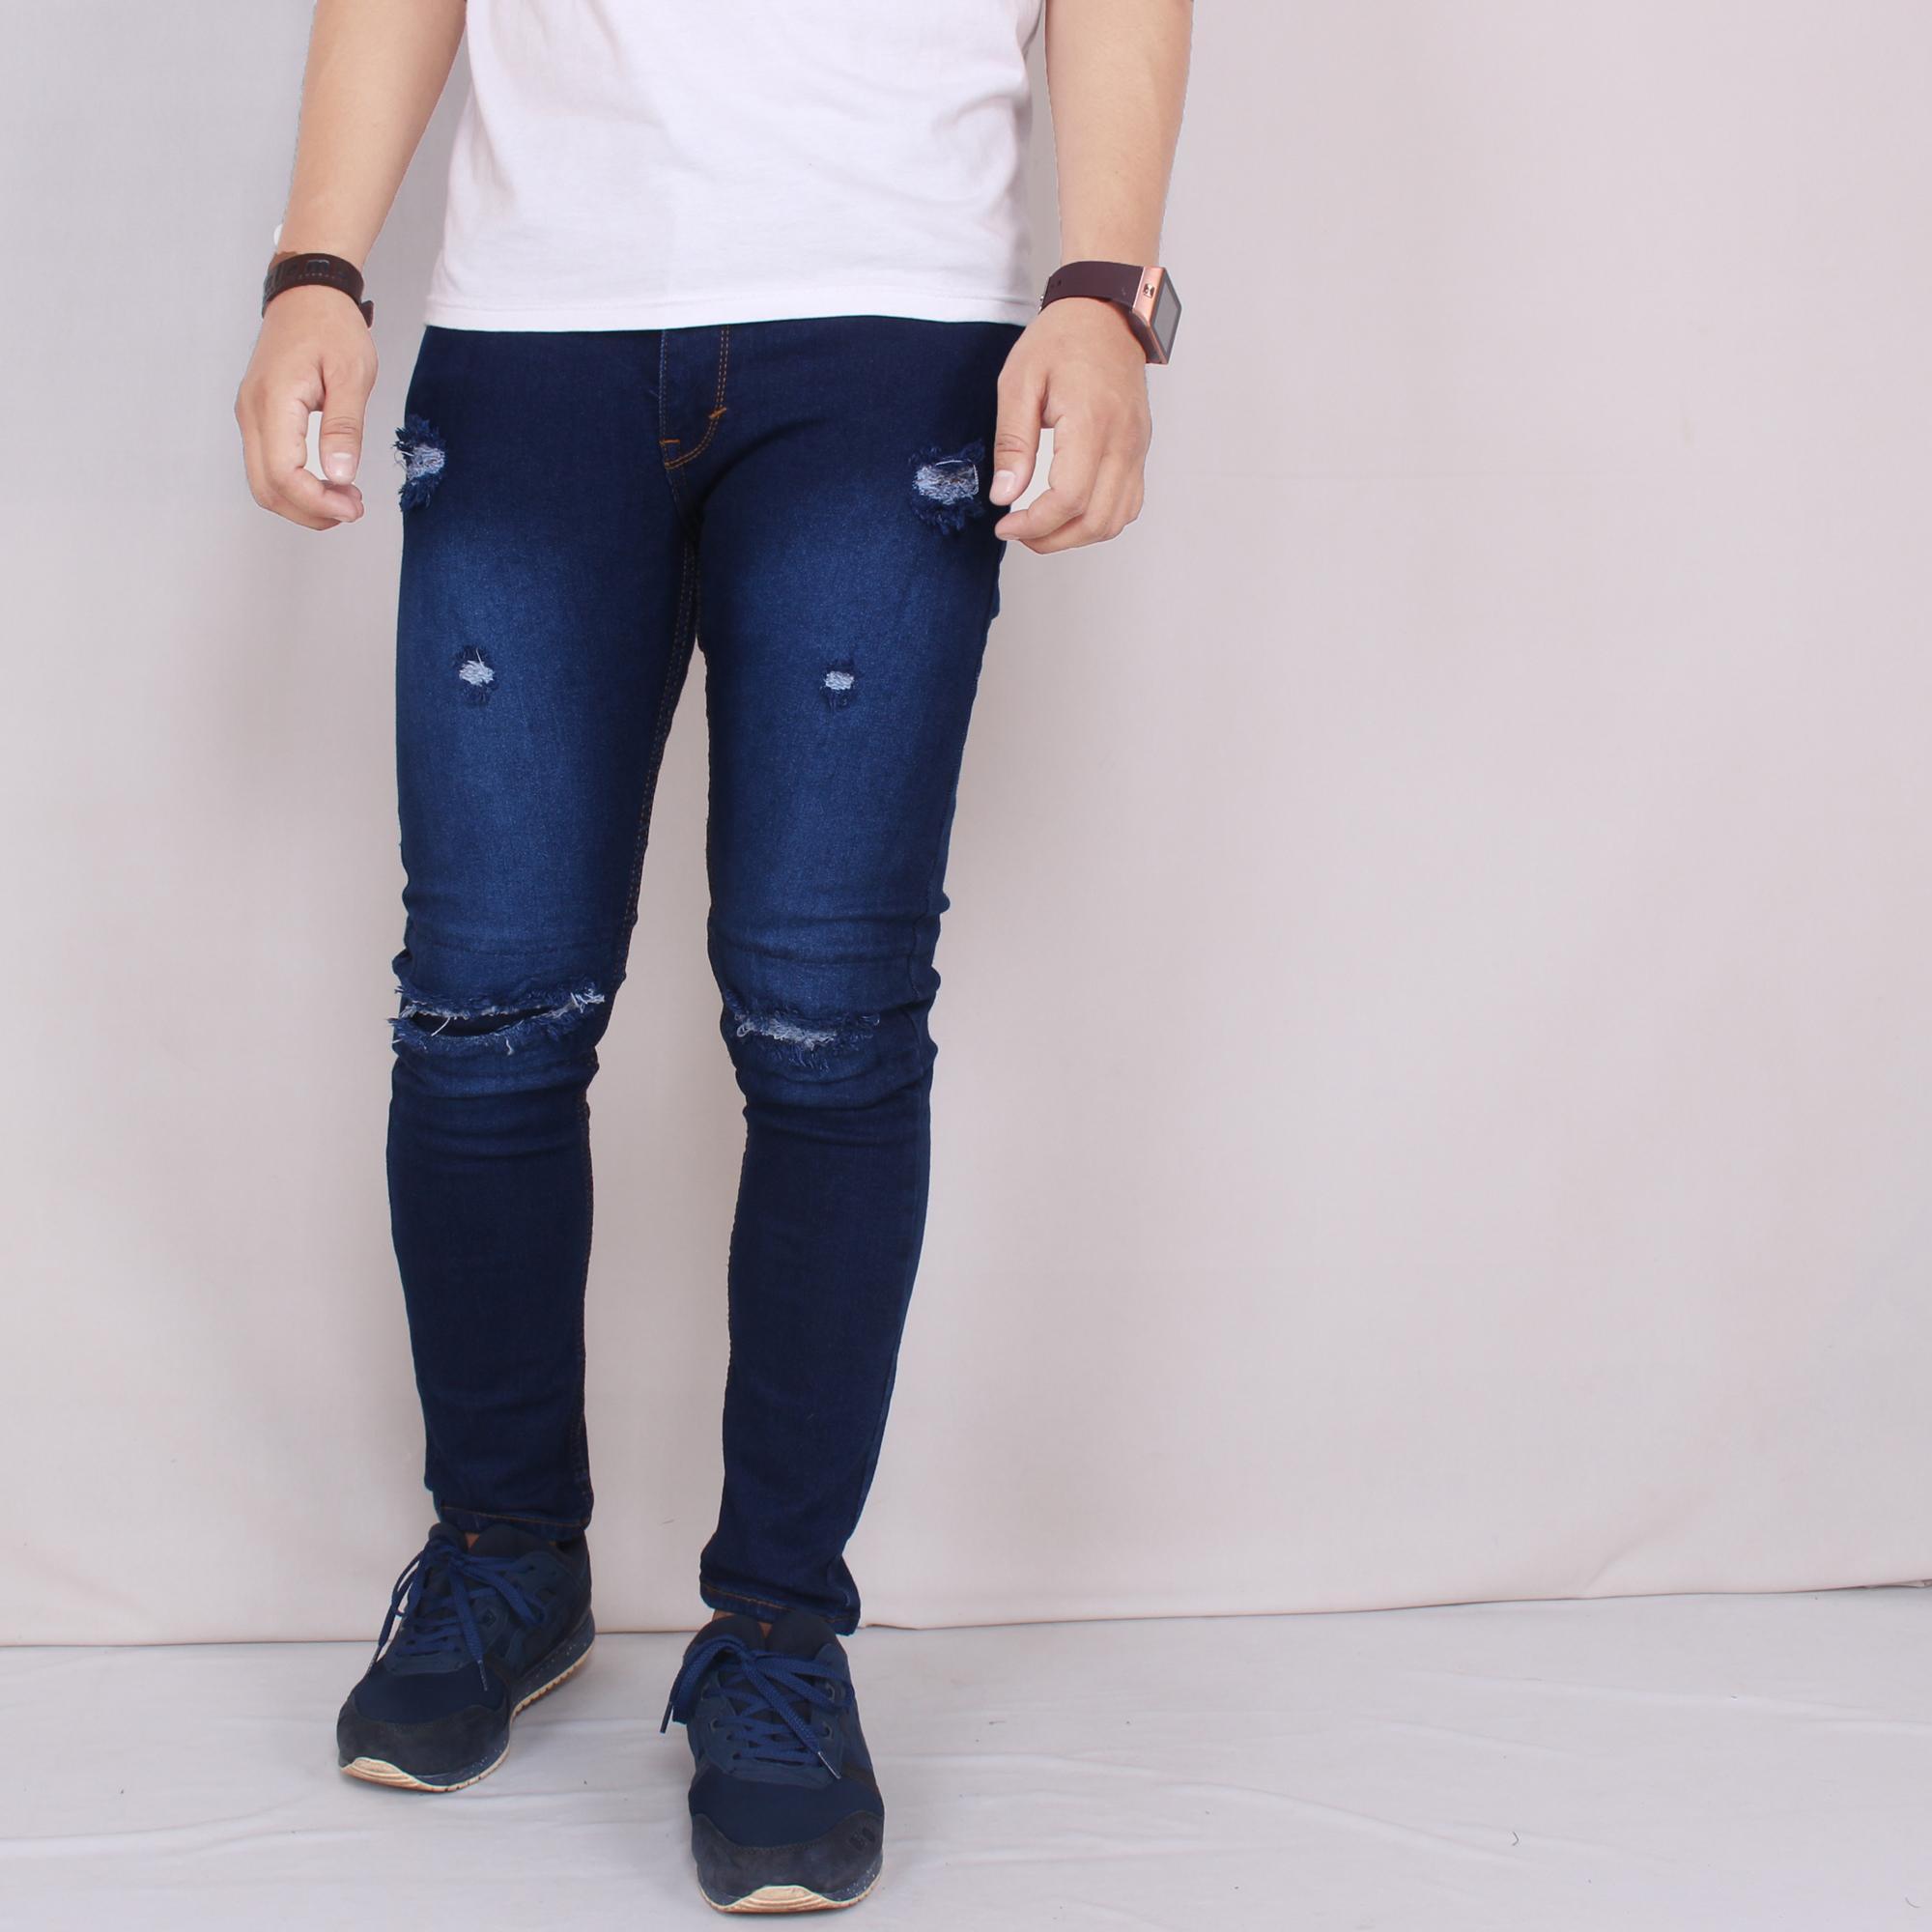 Zoeystore 5598 Celena Jeans Panjang Pria Celana Jeans Skinny Cowok Washing Bluesky Cut Rips Celana Jeans